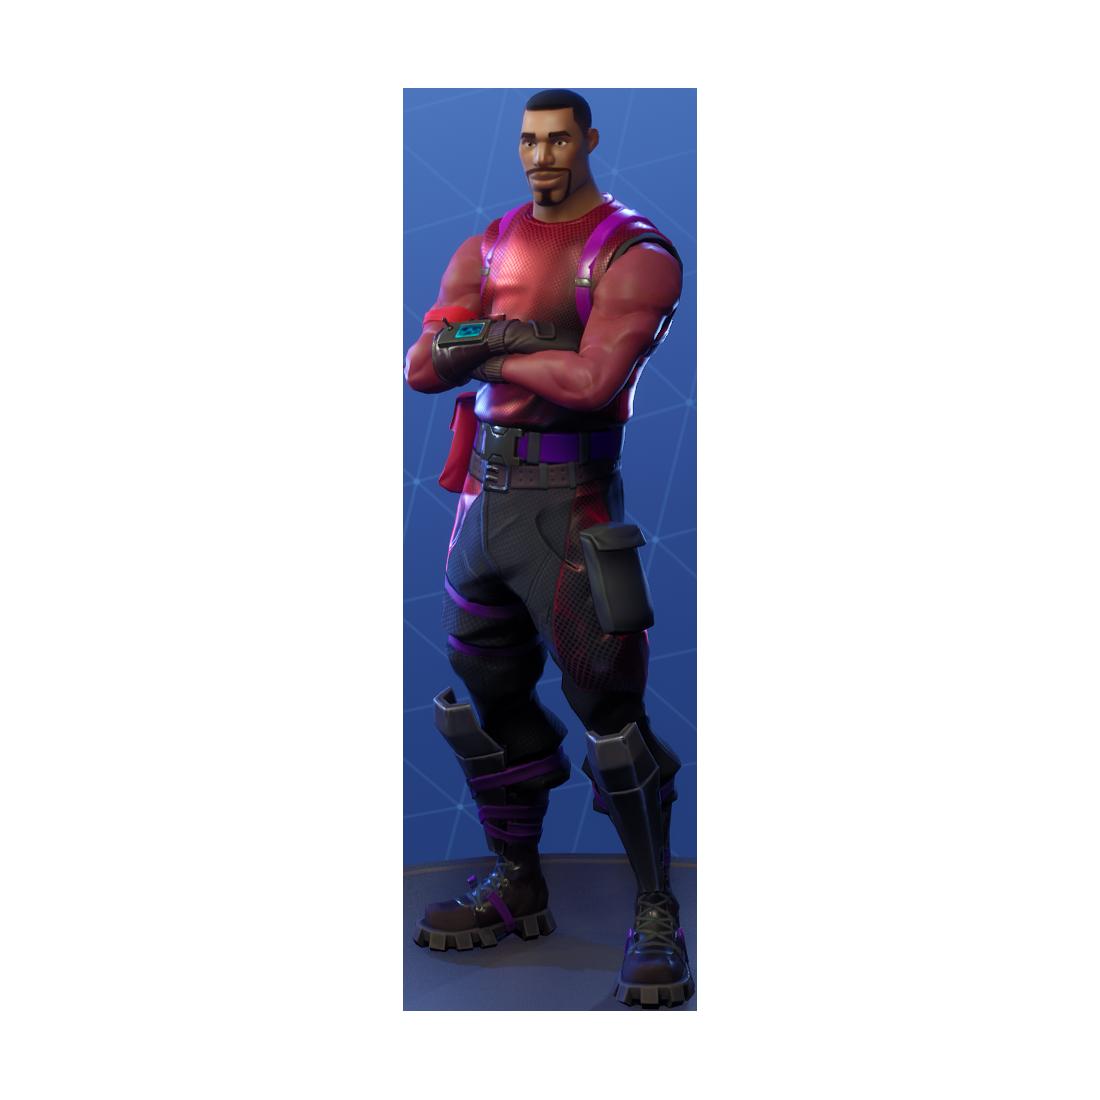 Radiant Striker - Лучезарный «Ударник» (Radiant Striker)